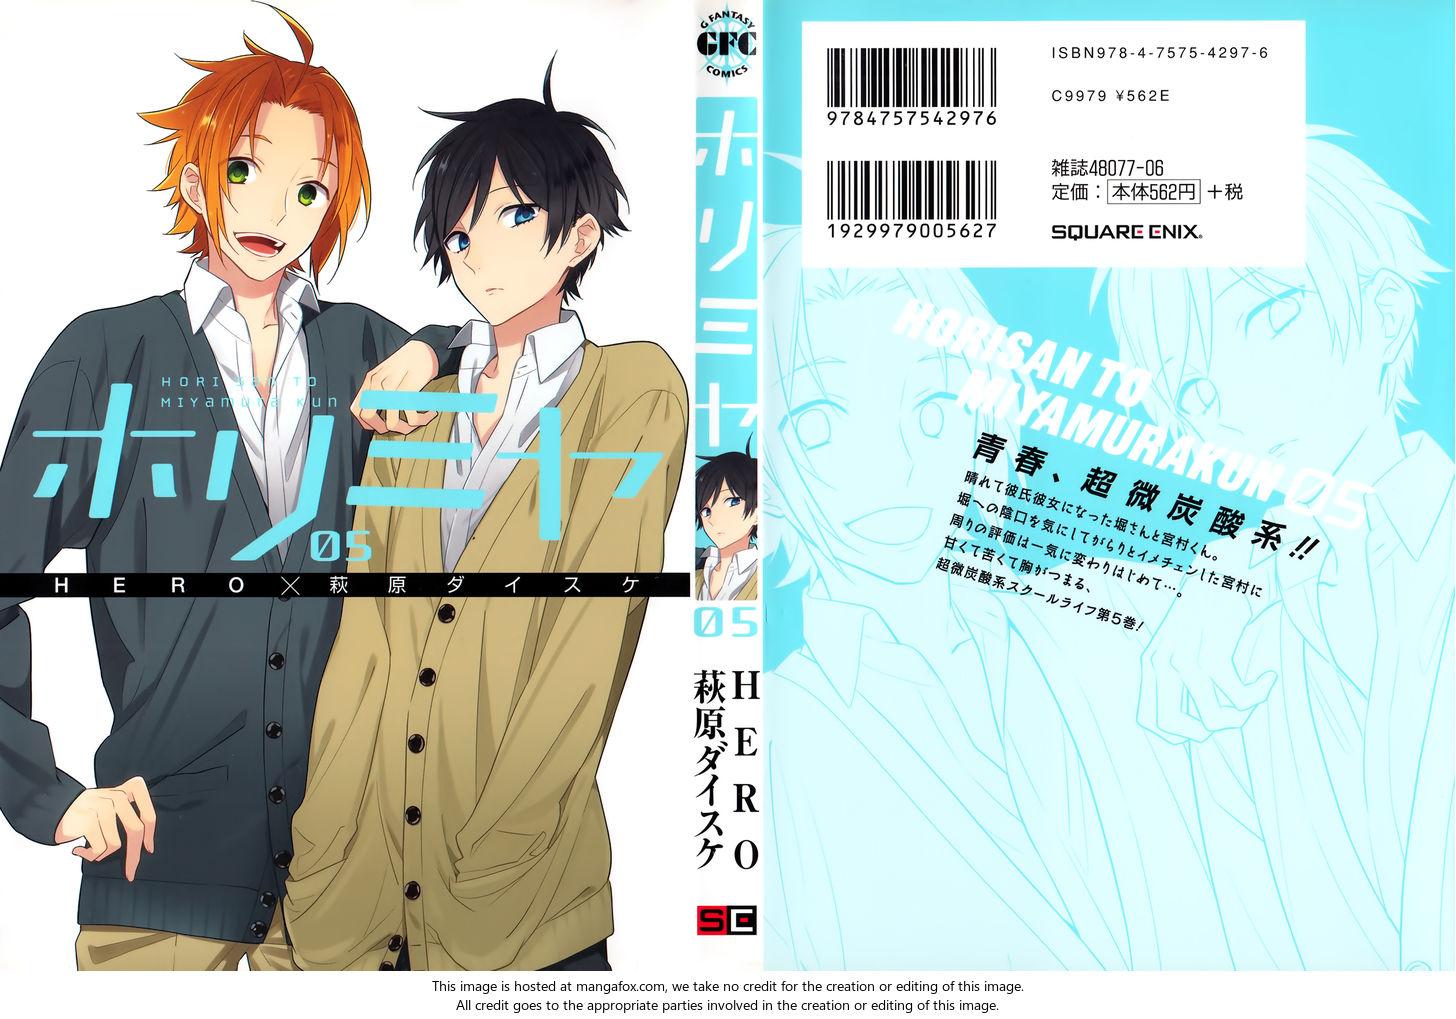 Horimiya 34.5: Extras at MangaFox